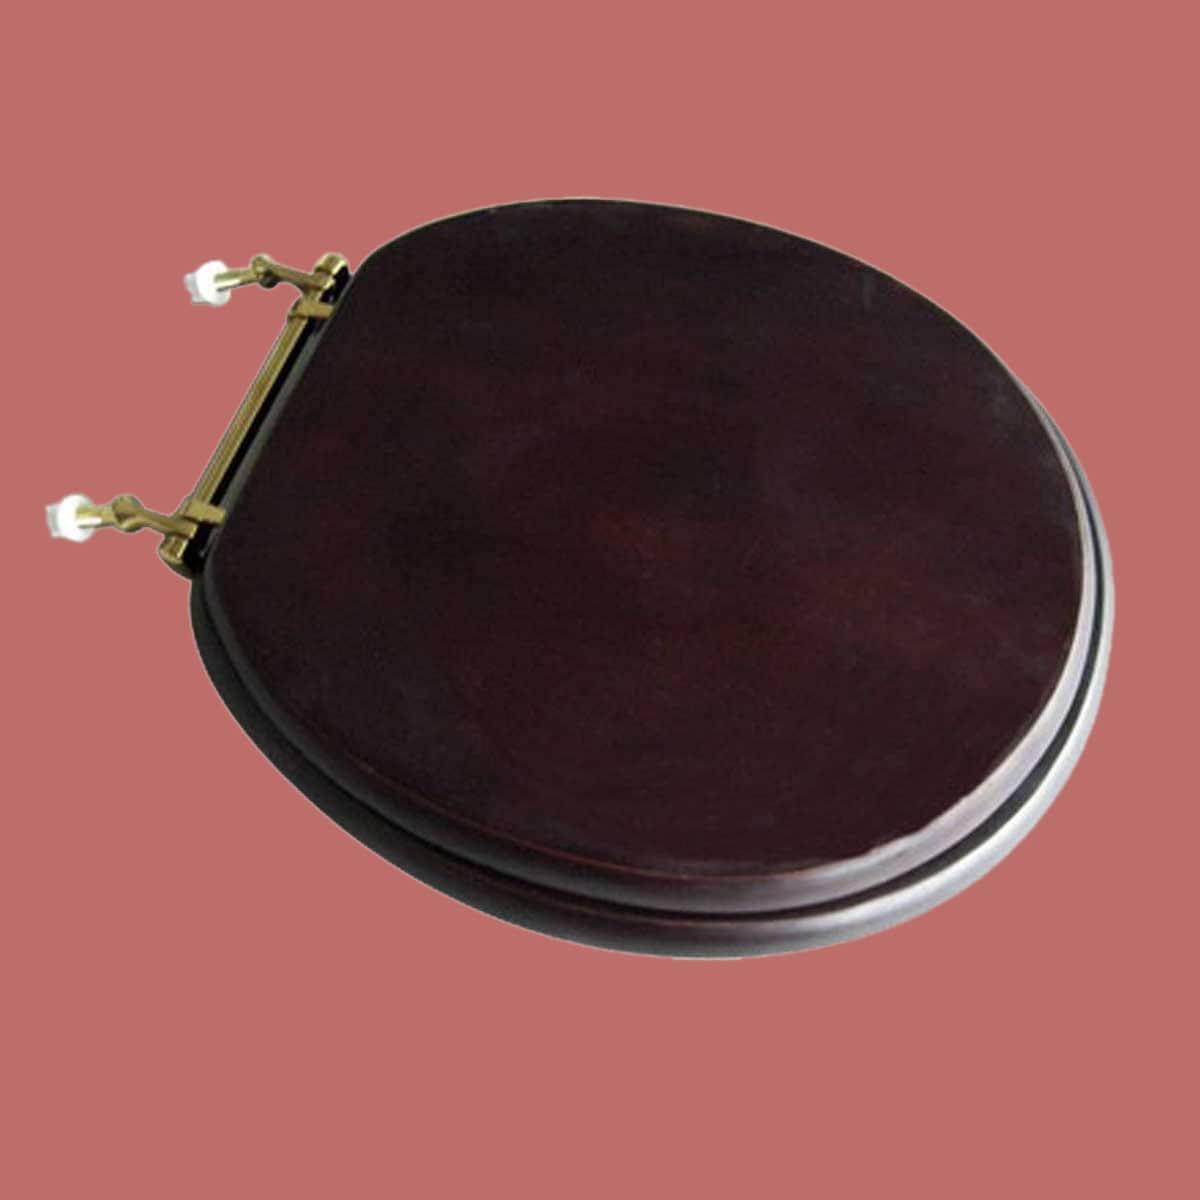 Superior Wonderful Cream Wooden Toilet Seat Ideas Best Inspiration Home Wooden  Toilet Seat.